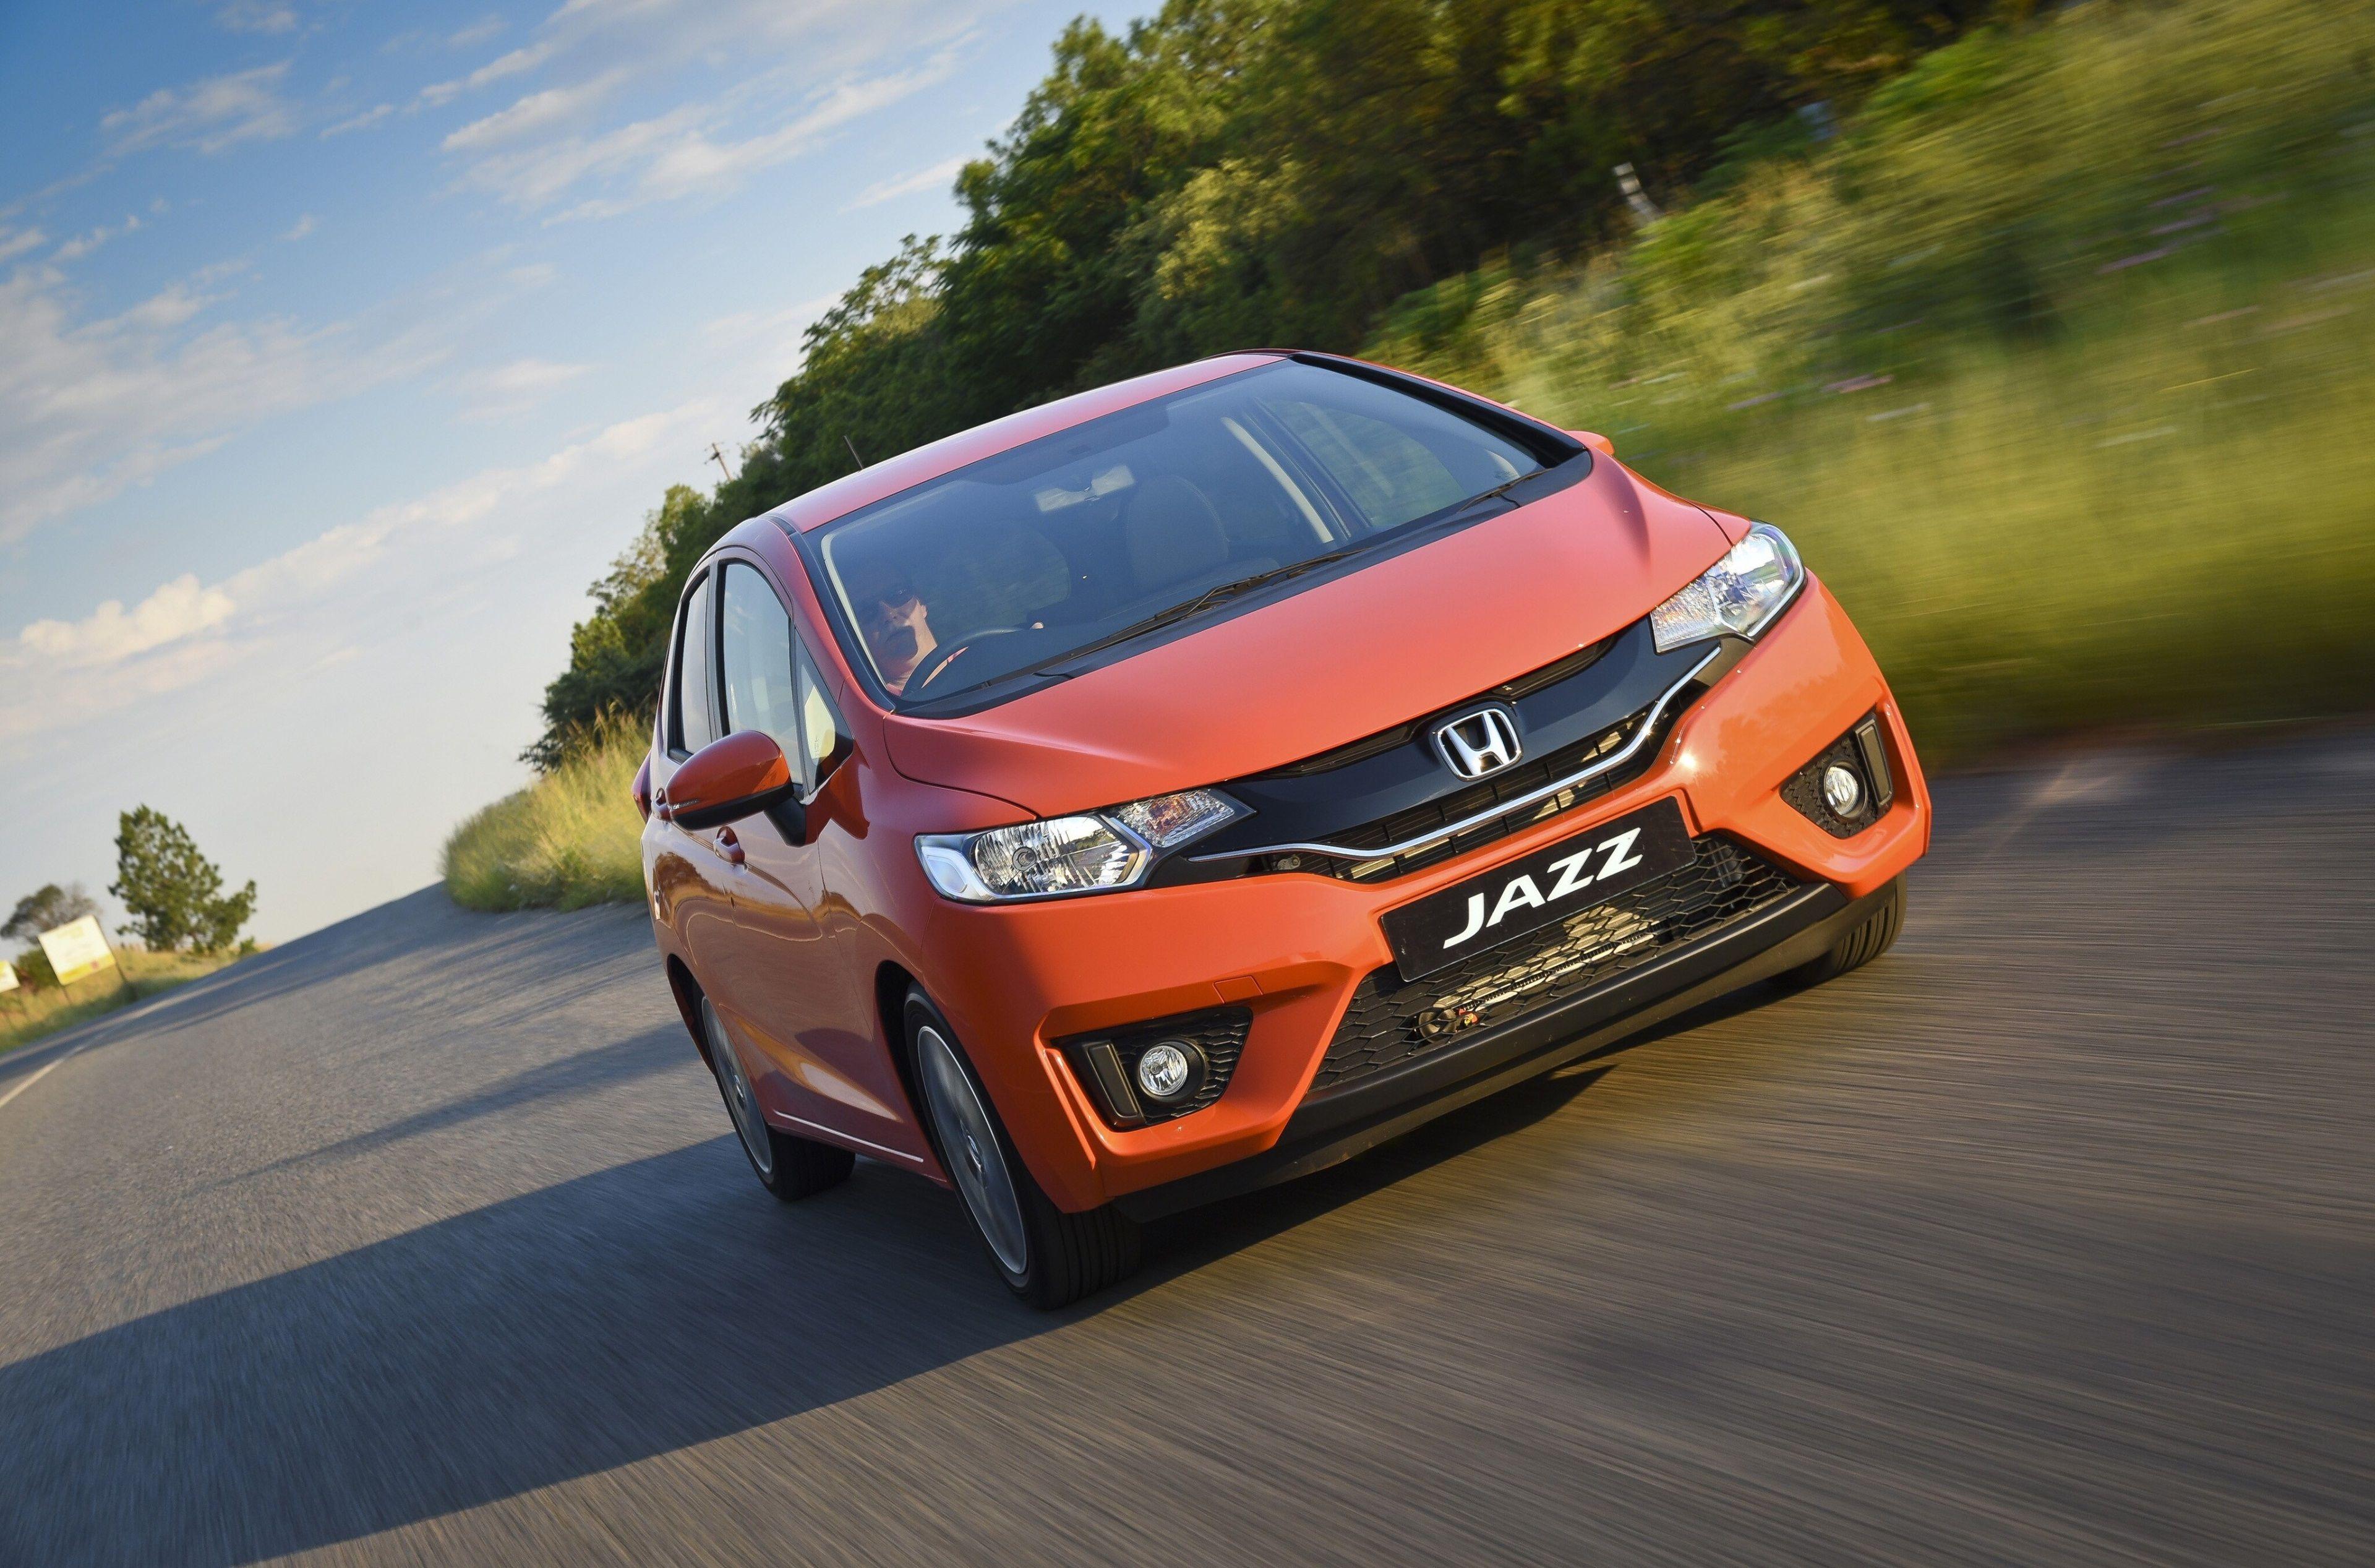 31+ Honda jazz 2019 features inspirations